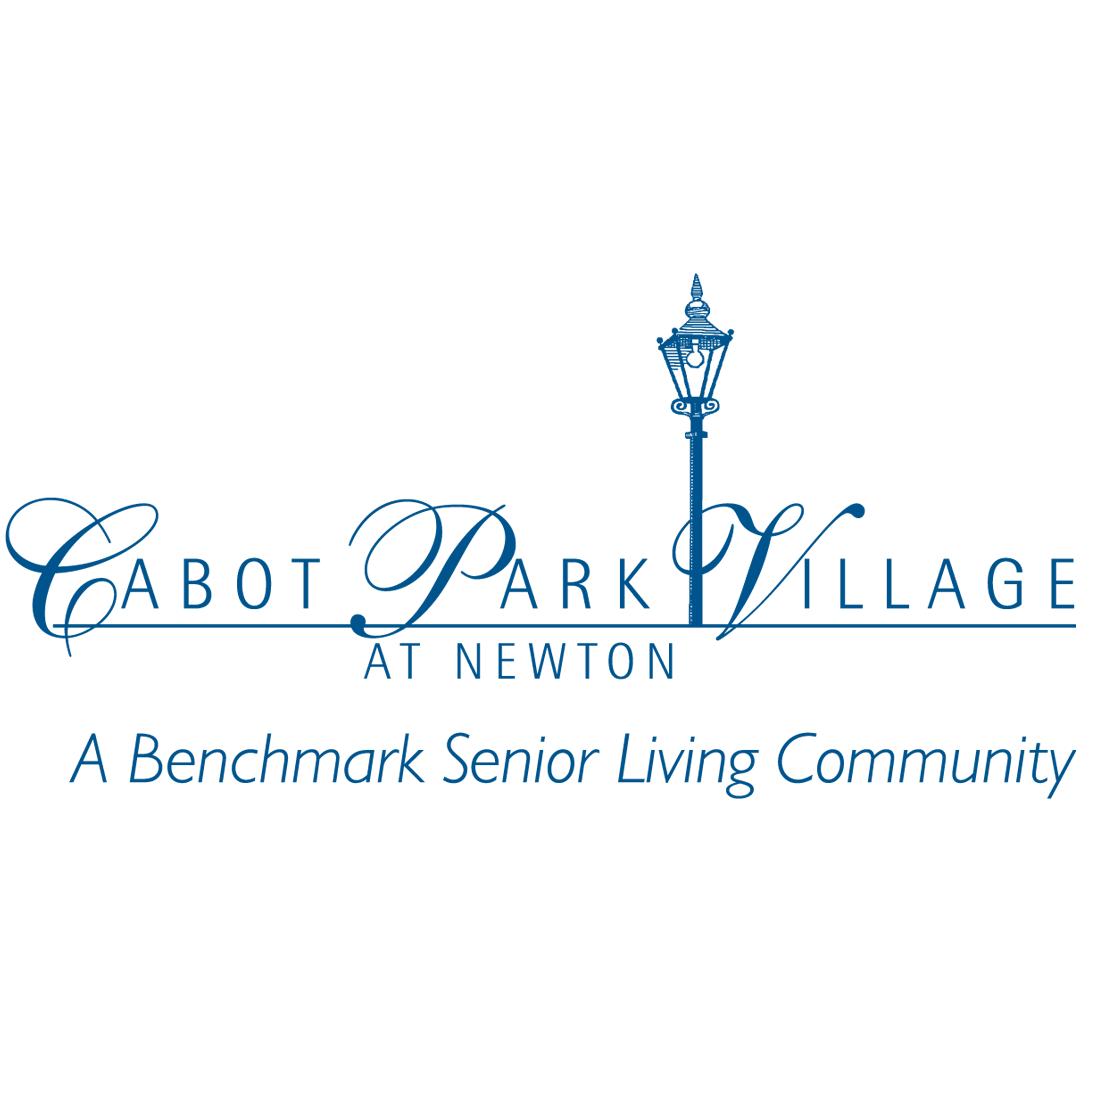 Cabot Park Village image 5